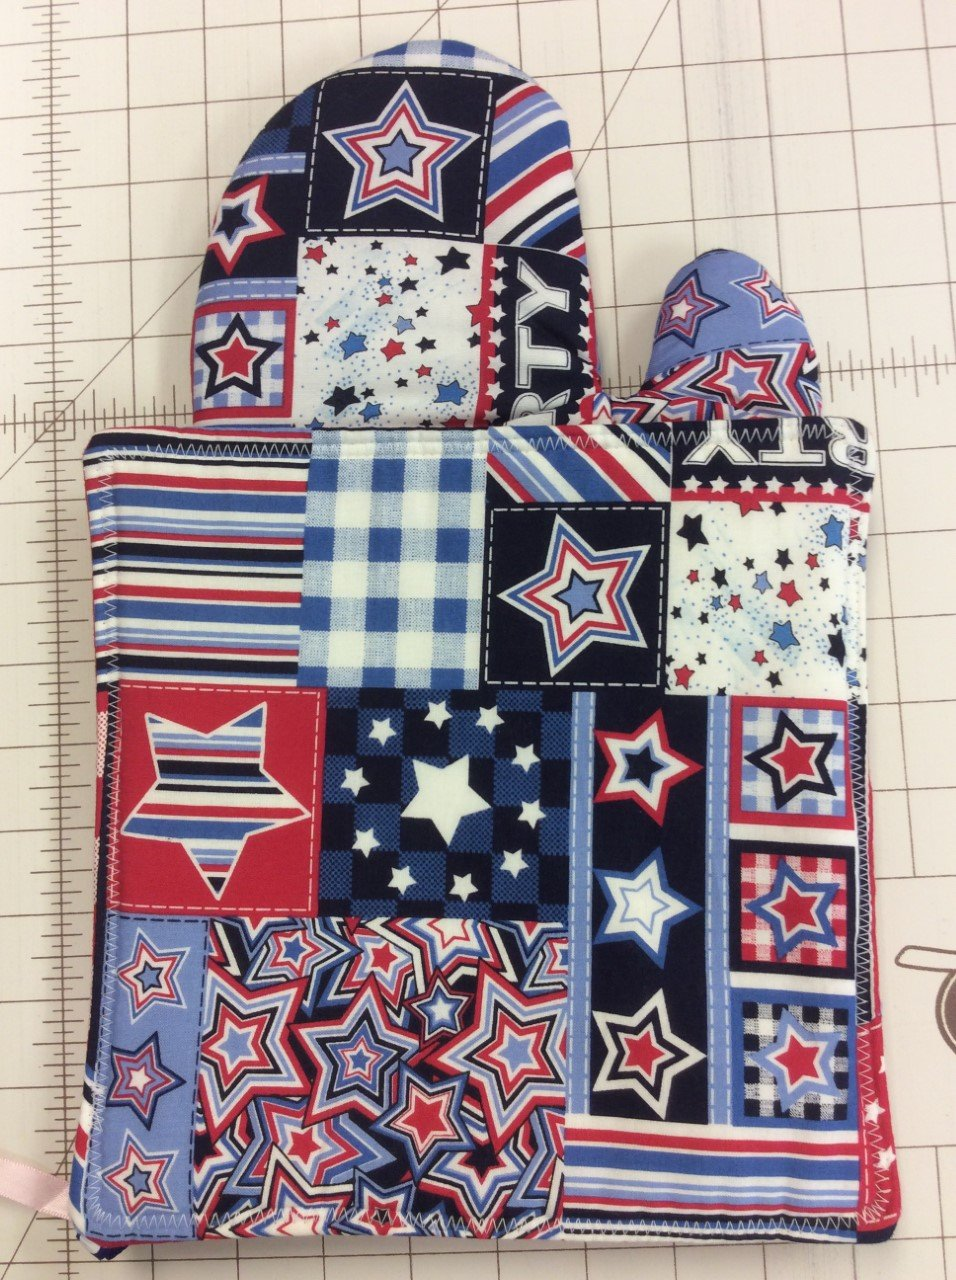 Oven Mitt&Hotpad Set-Stars and Stripes